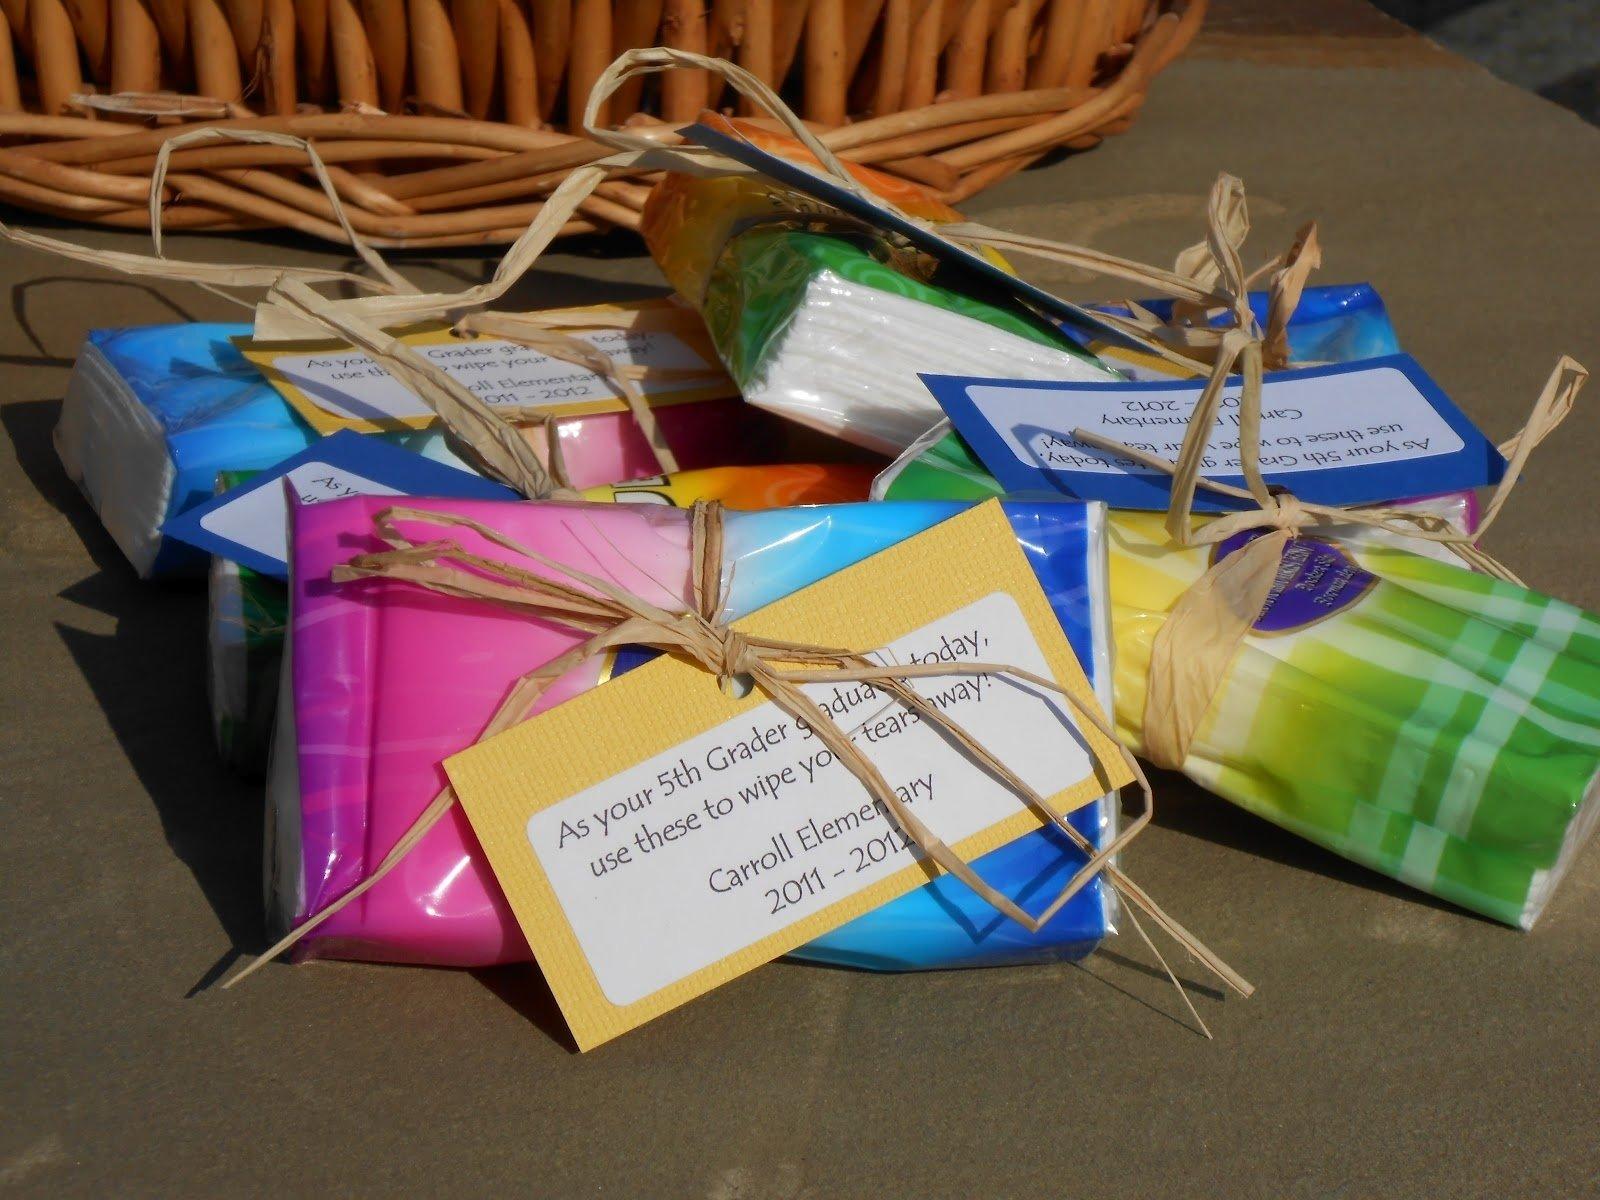 10 Fantastic 6Th Grade Graduation Party Ideas the craftin b 5th grade graduation tissue 2 2021